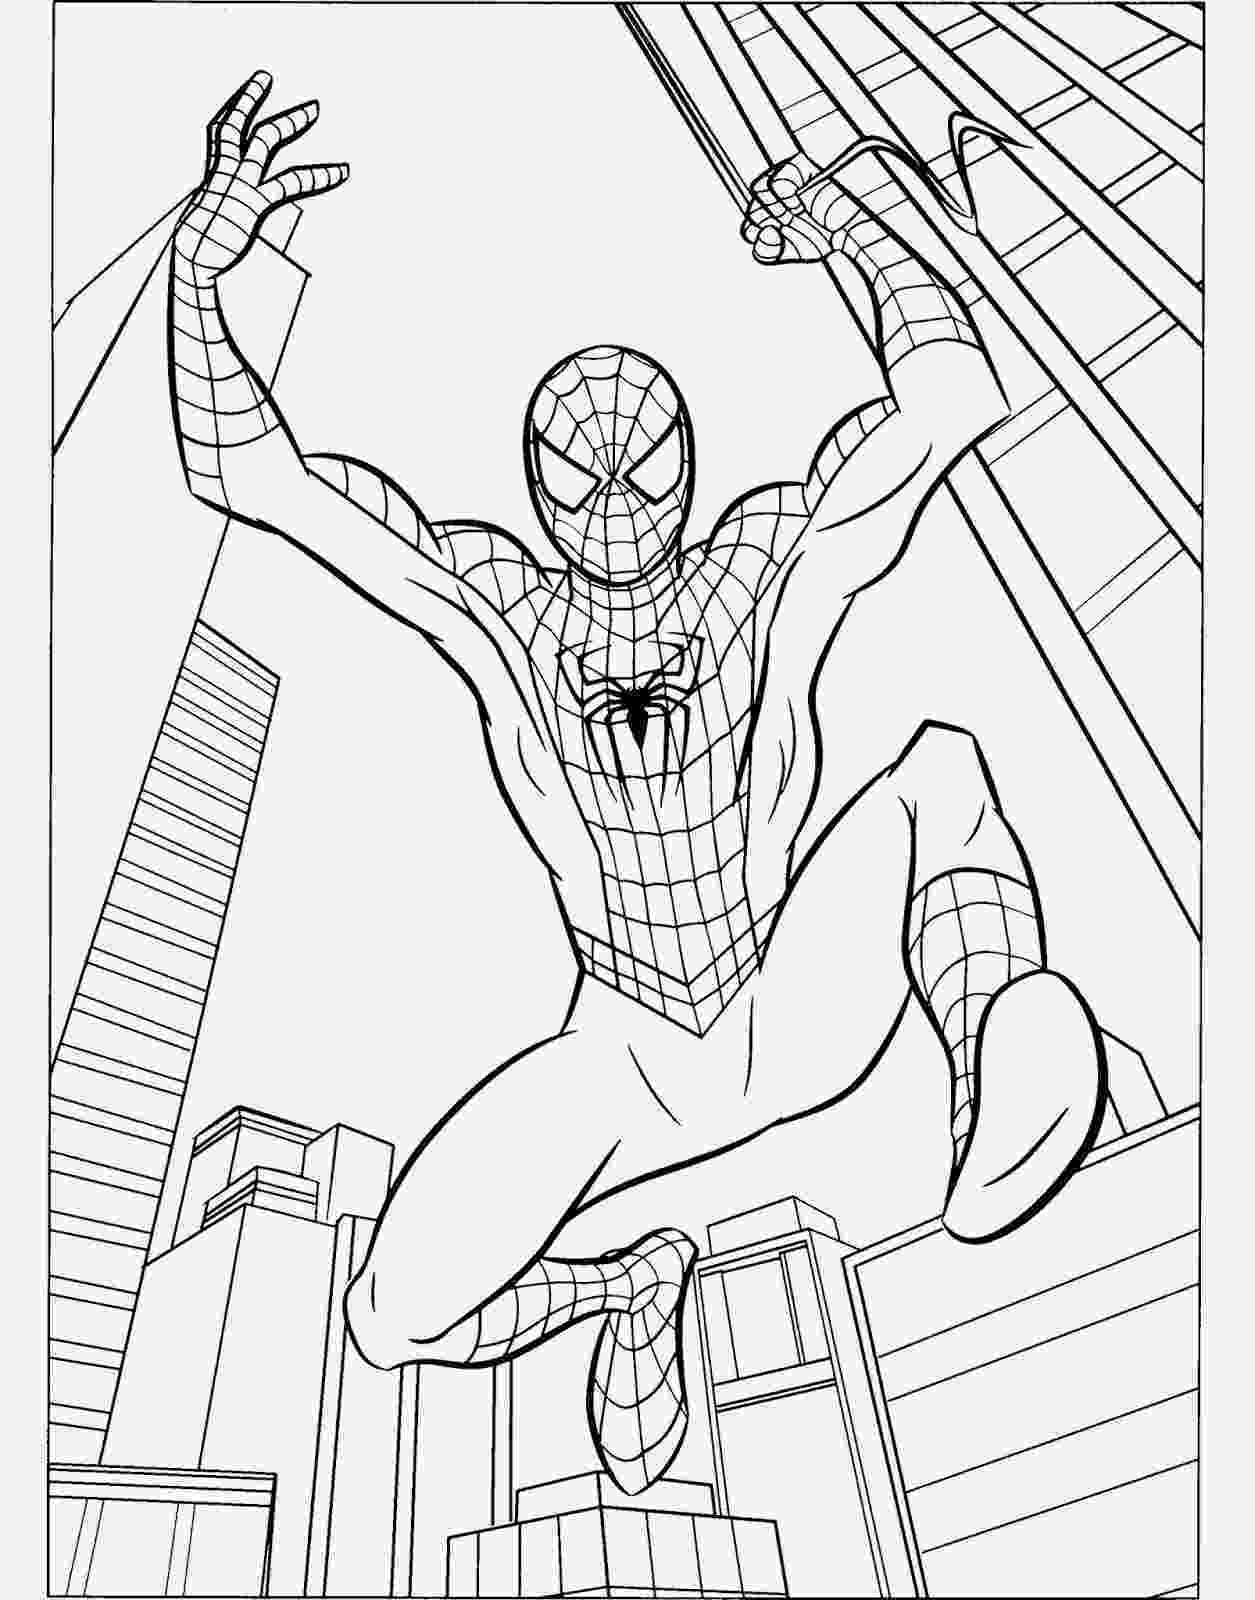 spiderman printout the amazing spider man coloring pages spiderman color printout spiderman